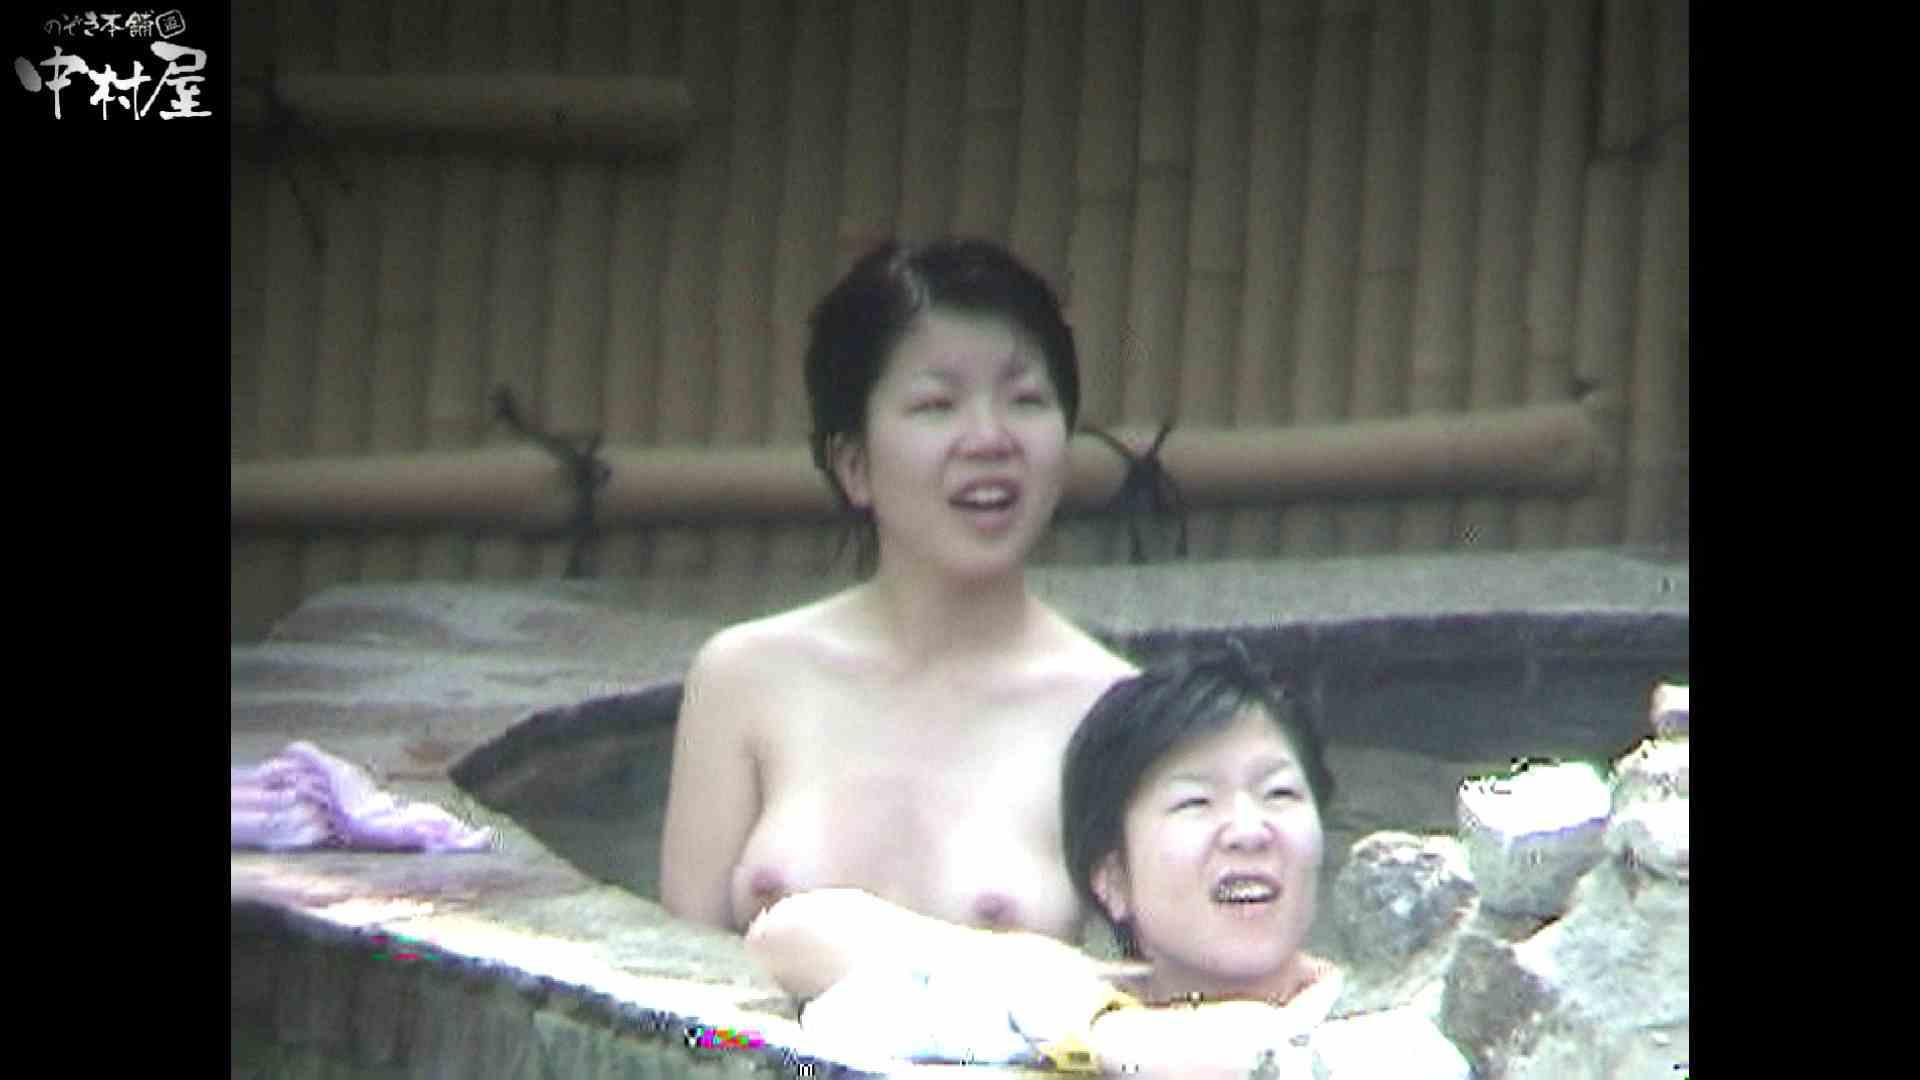 Aquaな露天風呂Vol.936 盗撮シリーズ | 露天風呂編  90PIX 5